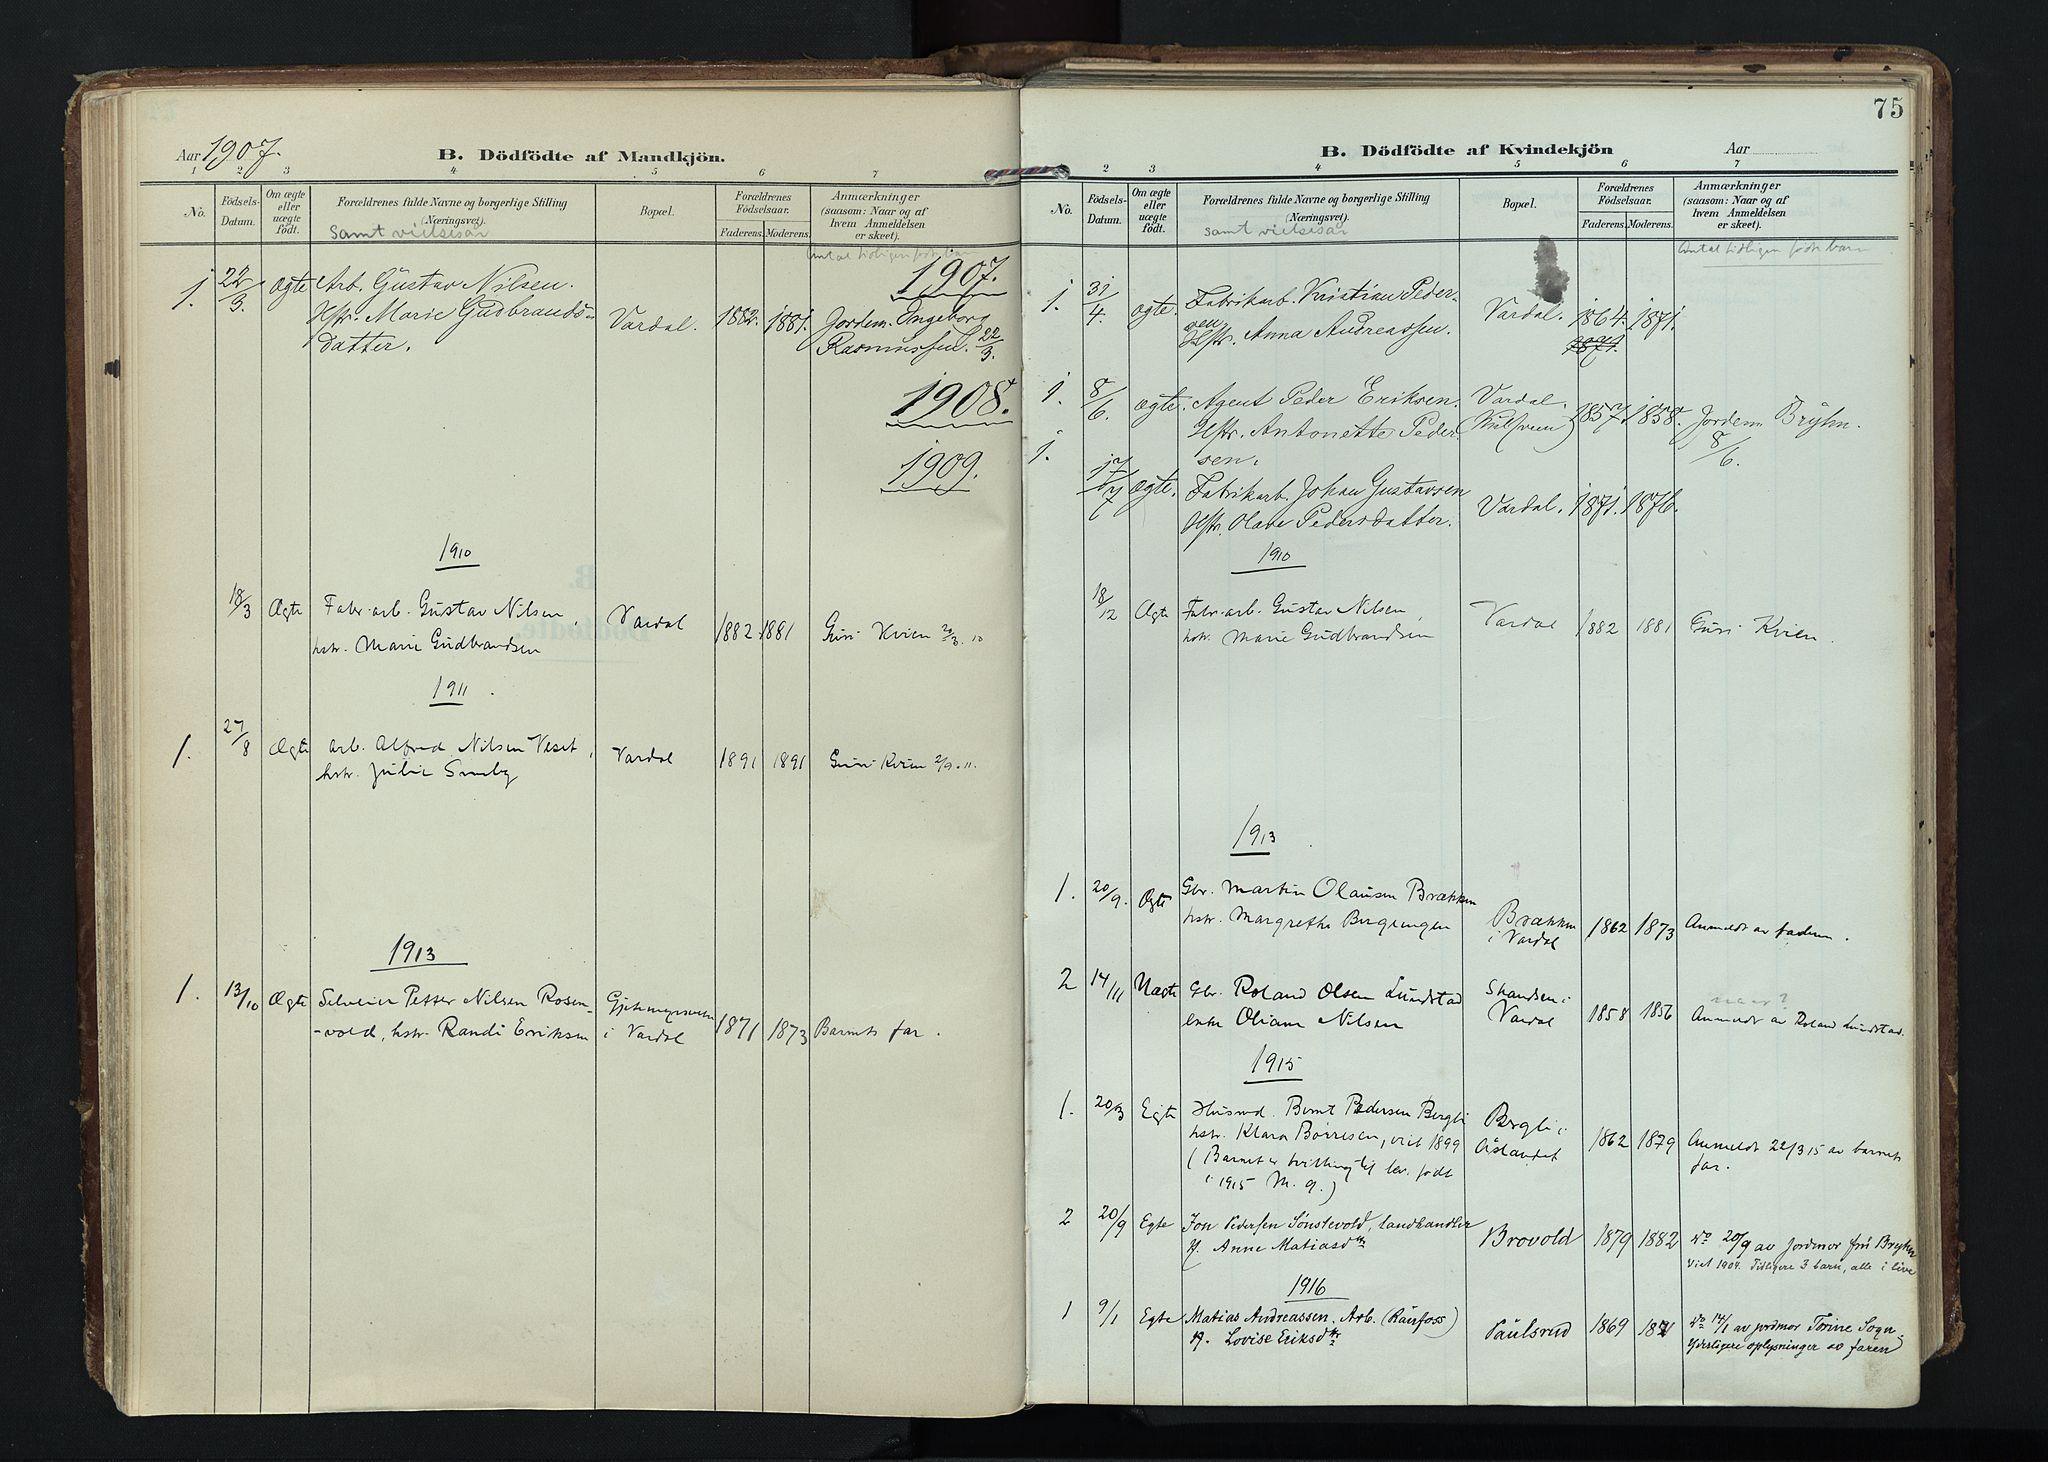 SAH, Vardal prestekontor, H/Ha/Haa/L0020: Ministerialbok nr. 20, 1907-1921, s. 75